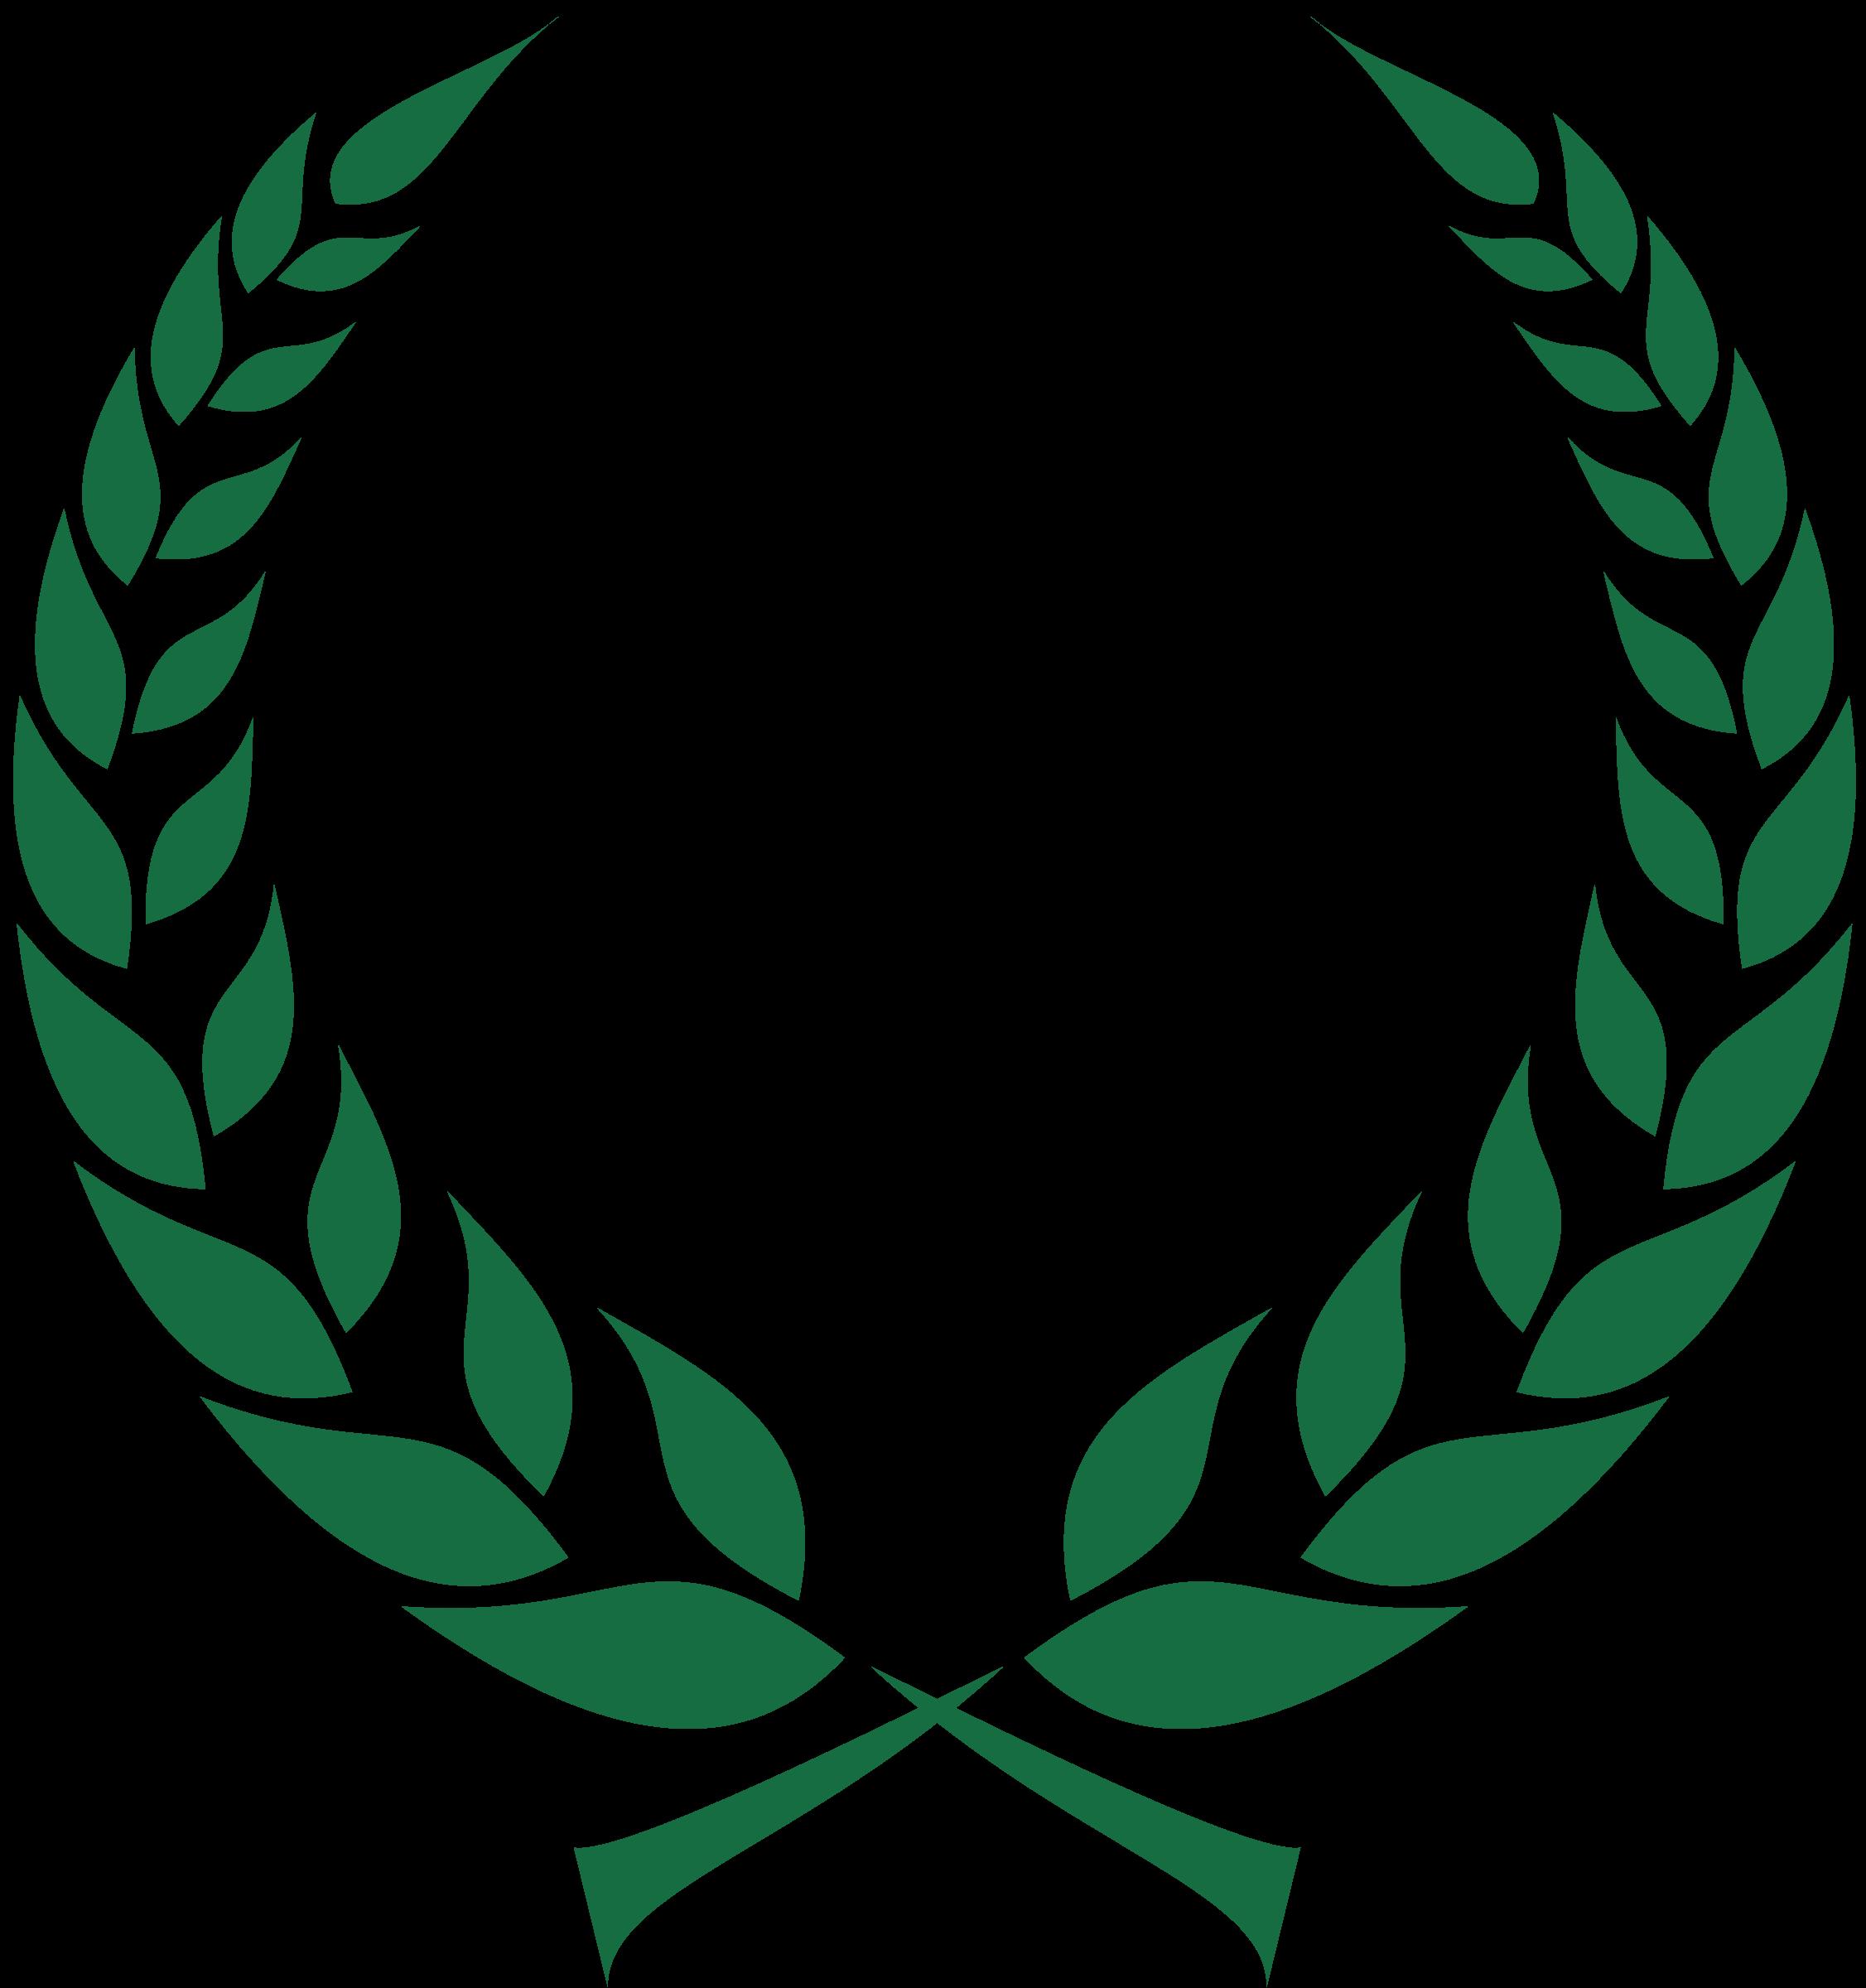 Wreath clipart crown Wreath Olive Cliparts Clip Clip